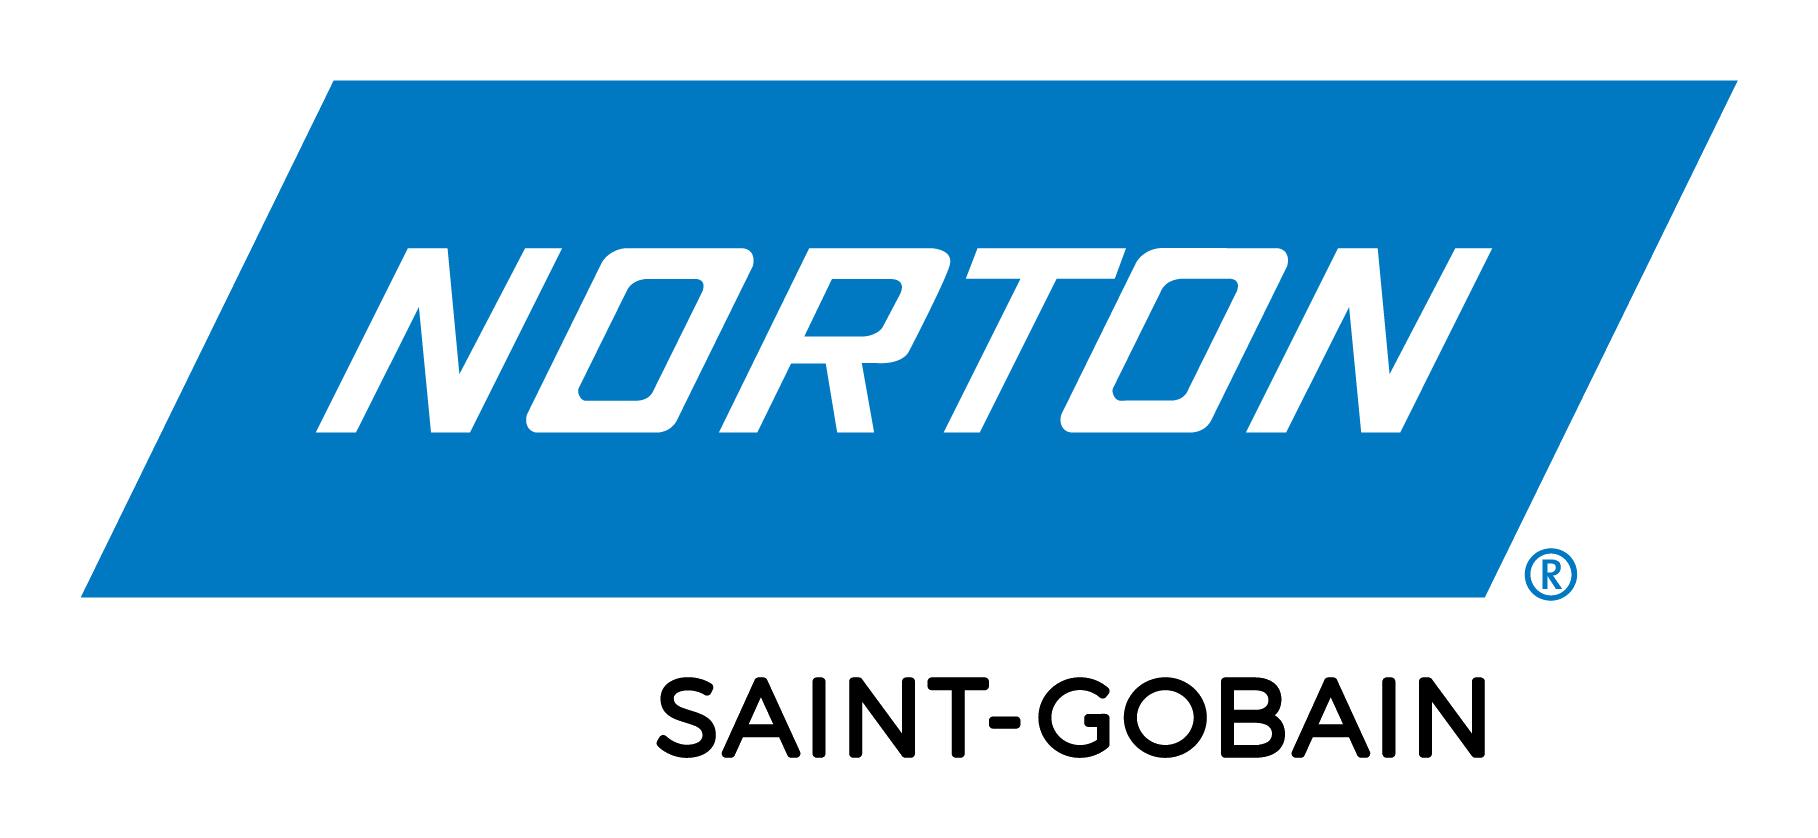 SG_Norton_logo_rgb_6